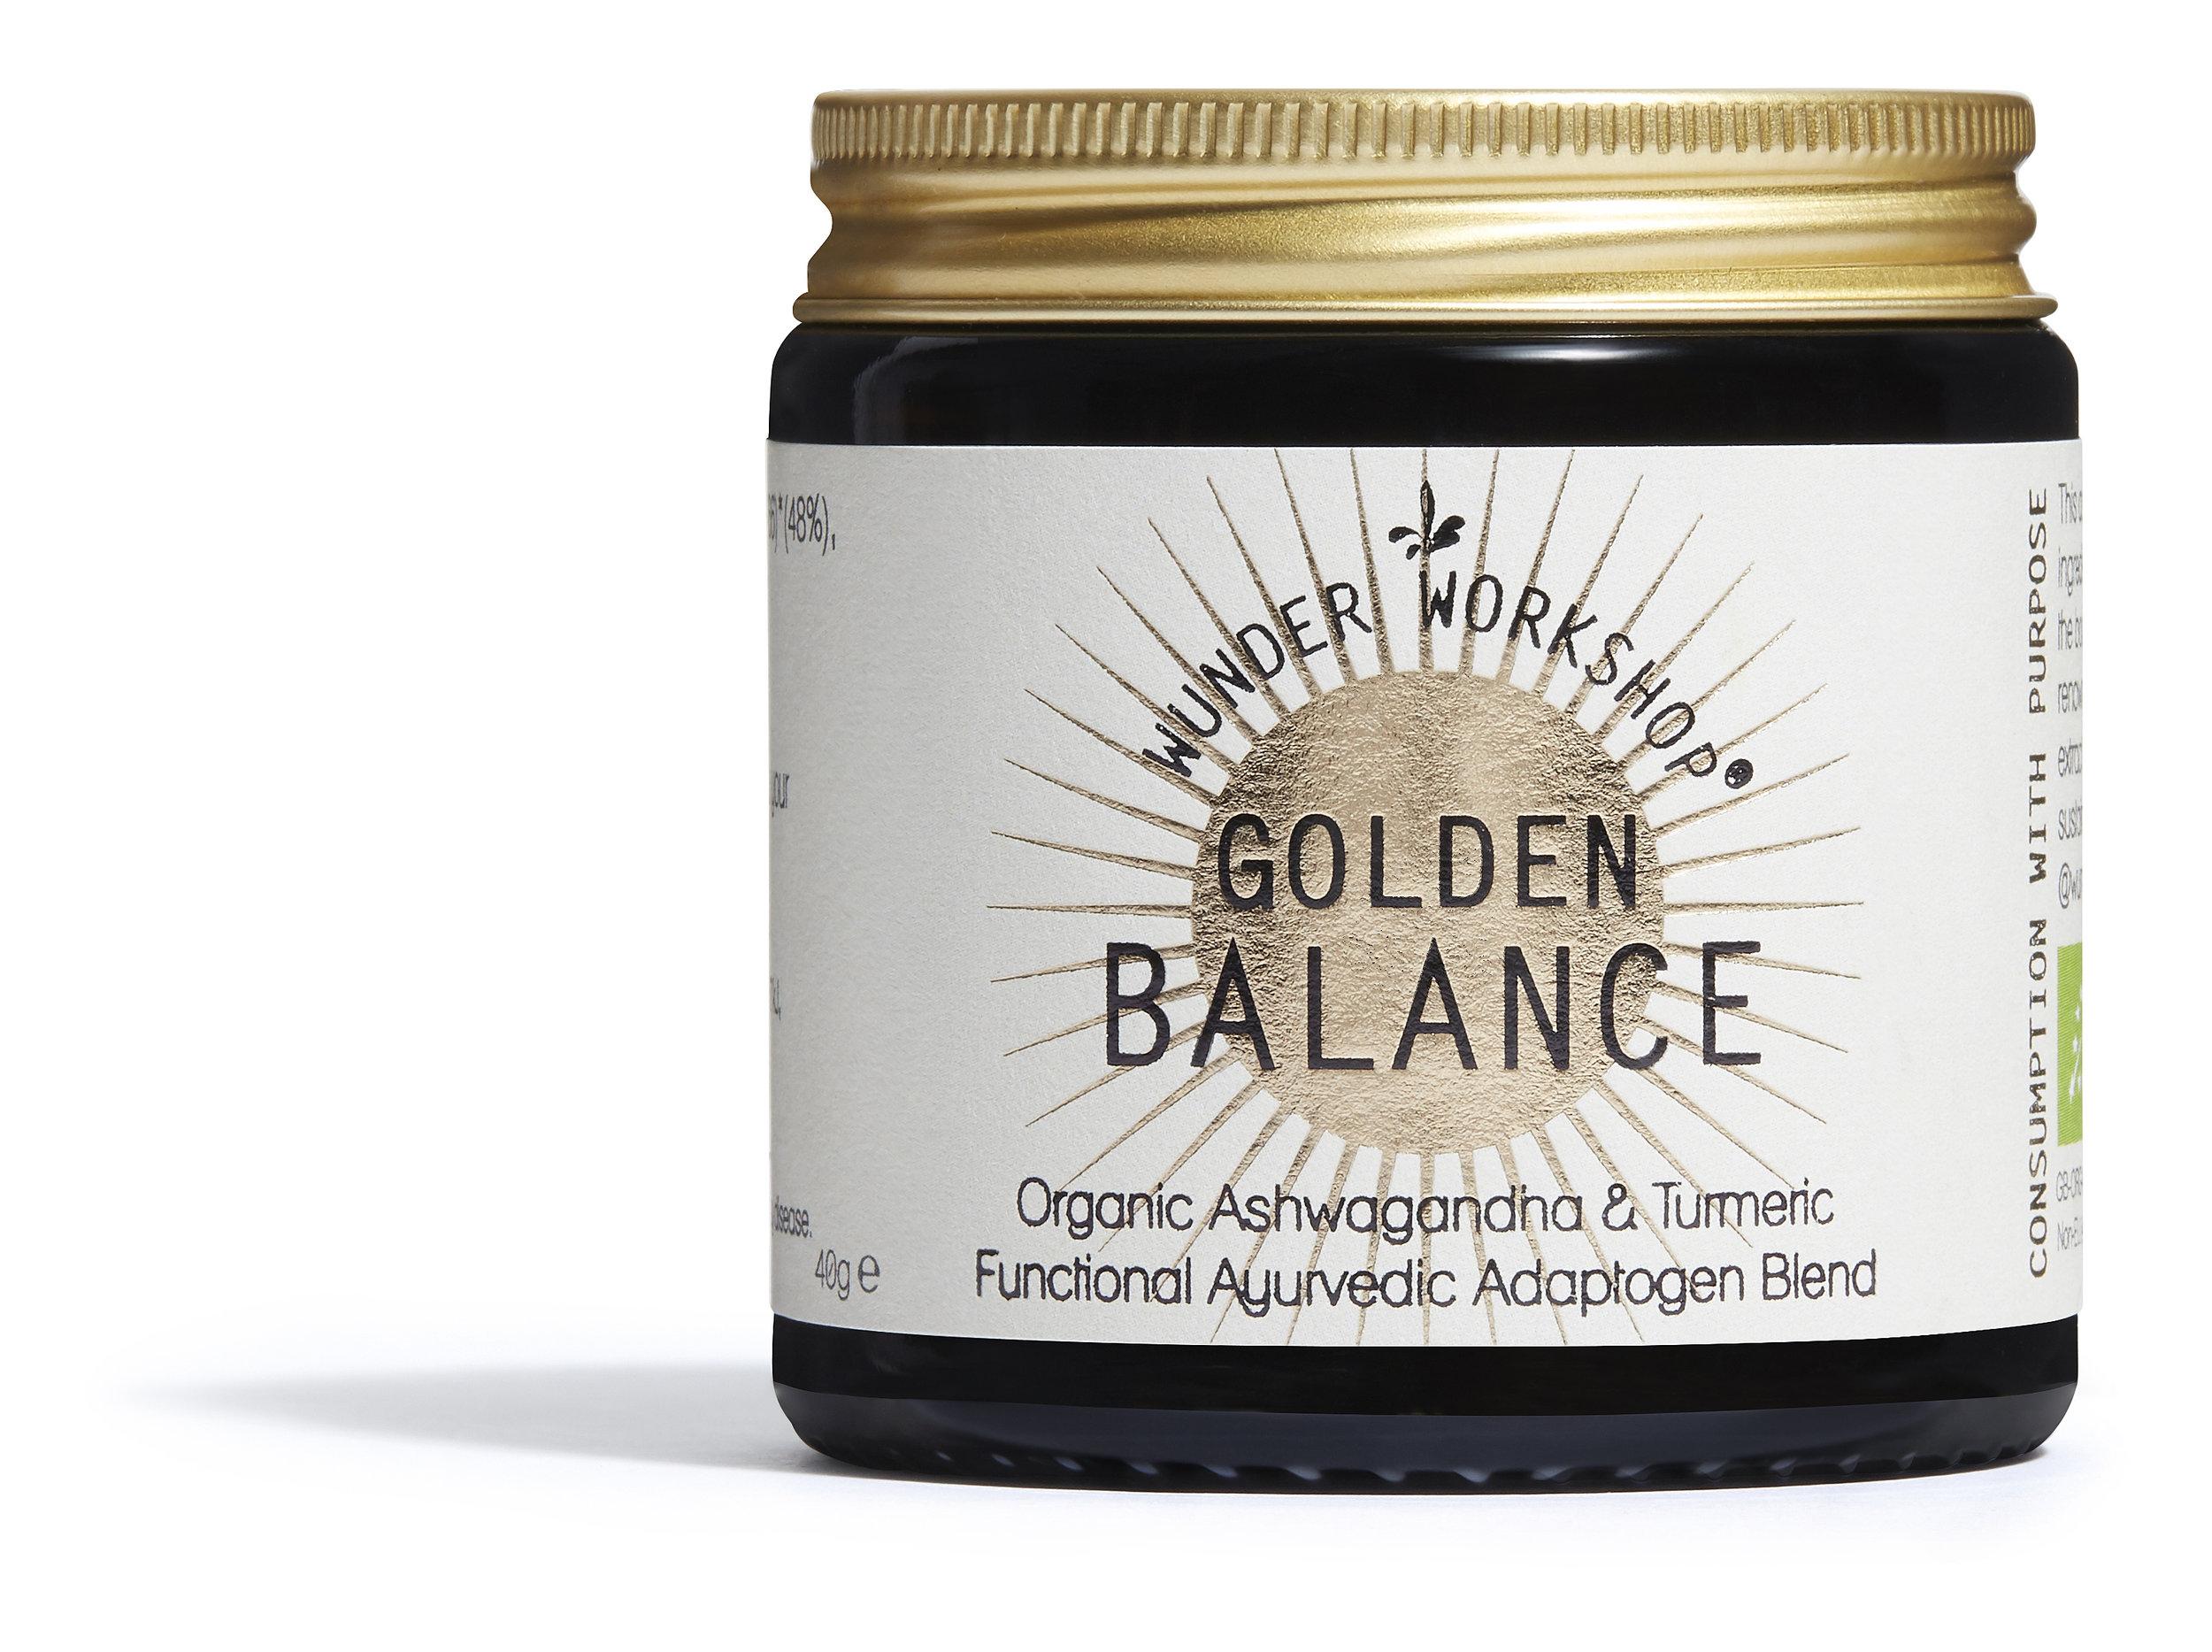 Golden Balance adaptogens